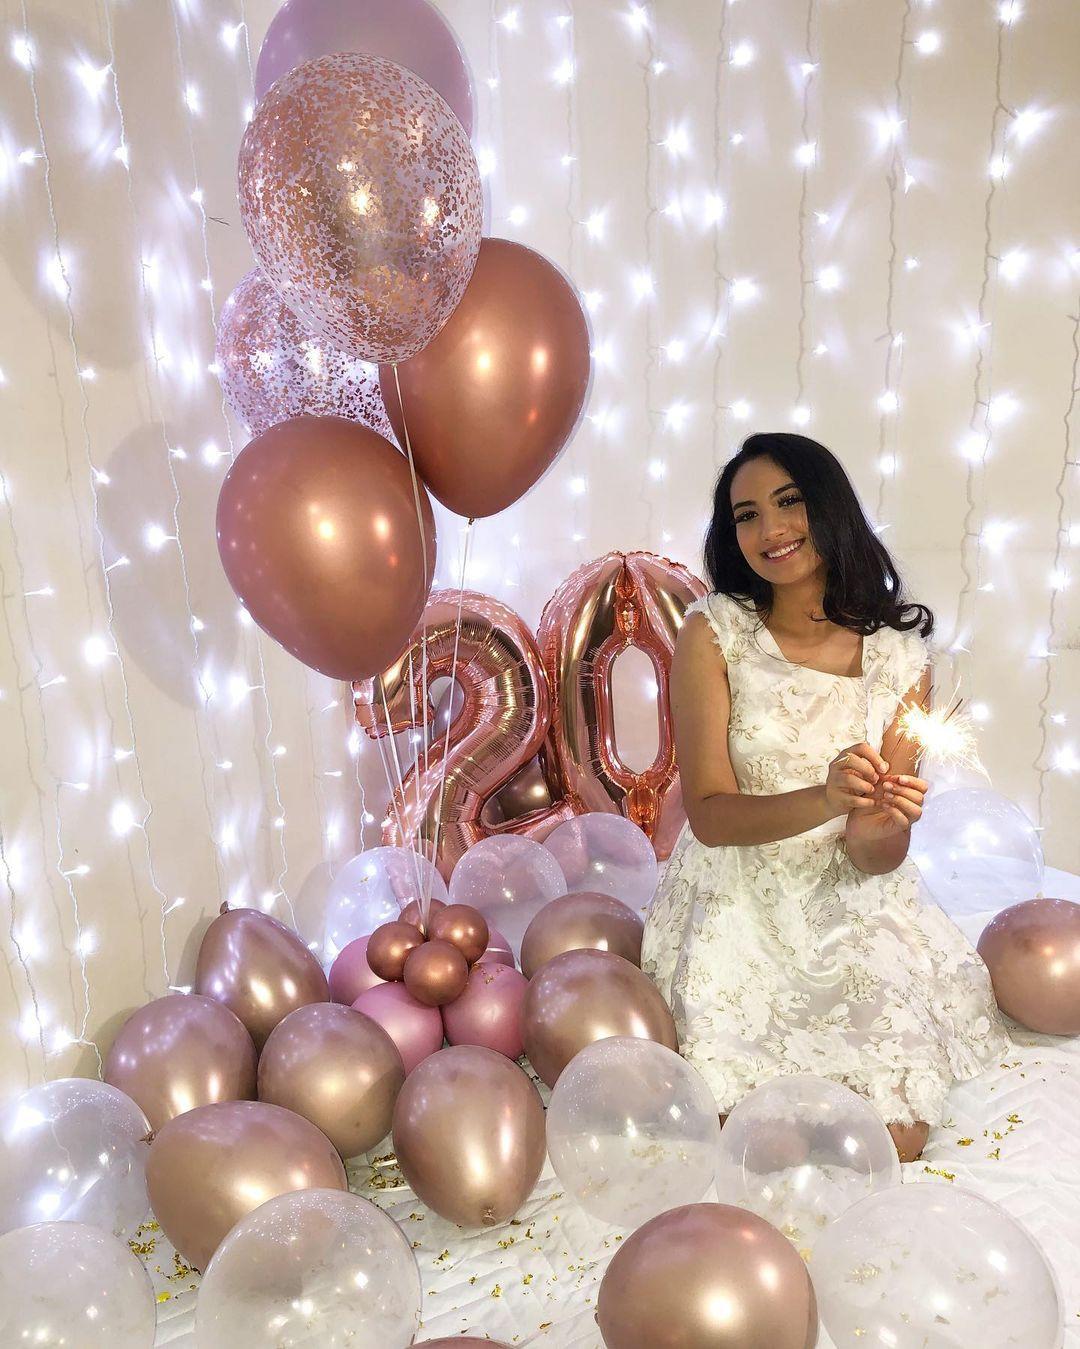 sandy menezes, miss grande sao paulo mundo 2019. - Página 5 Fmao8b10